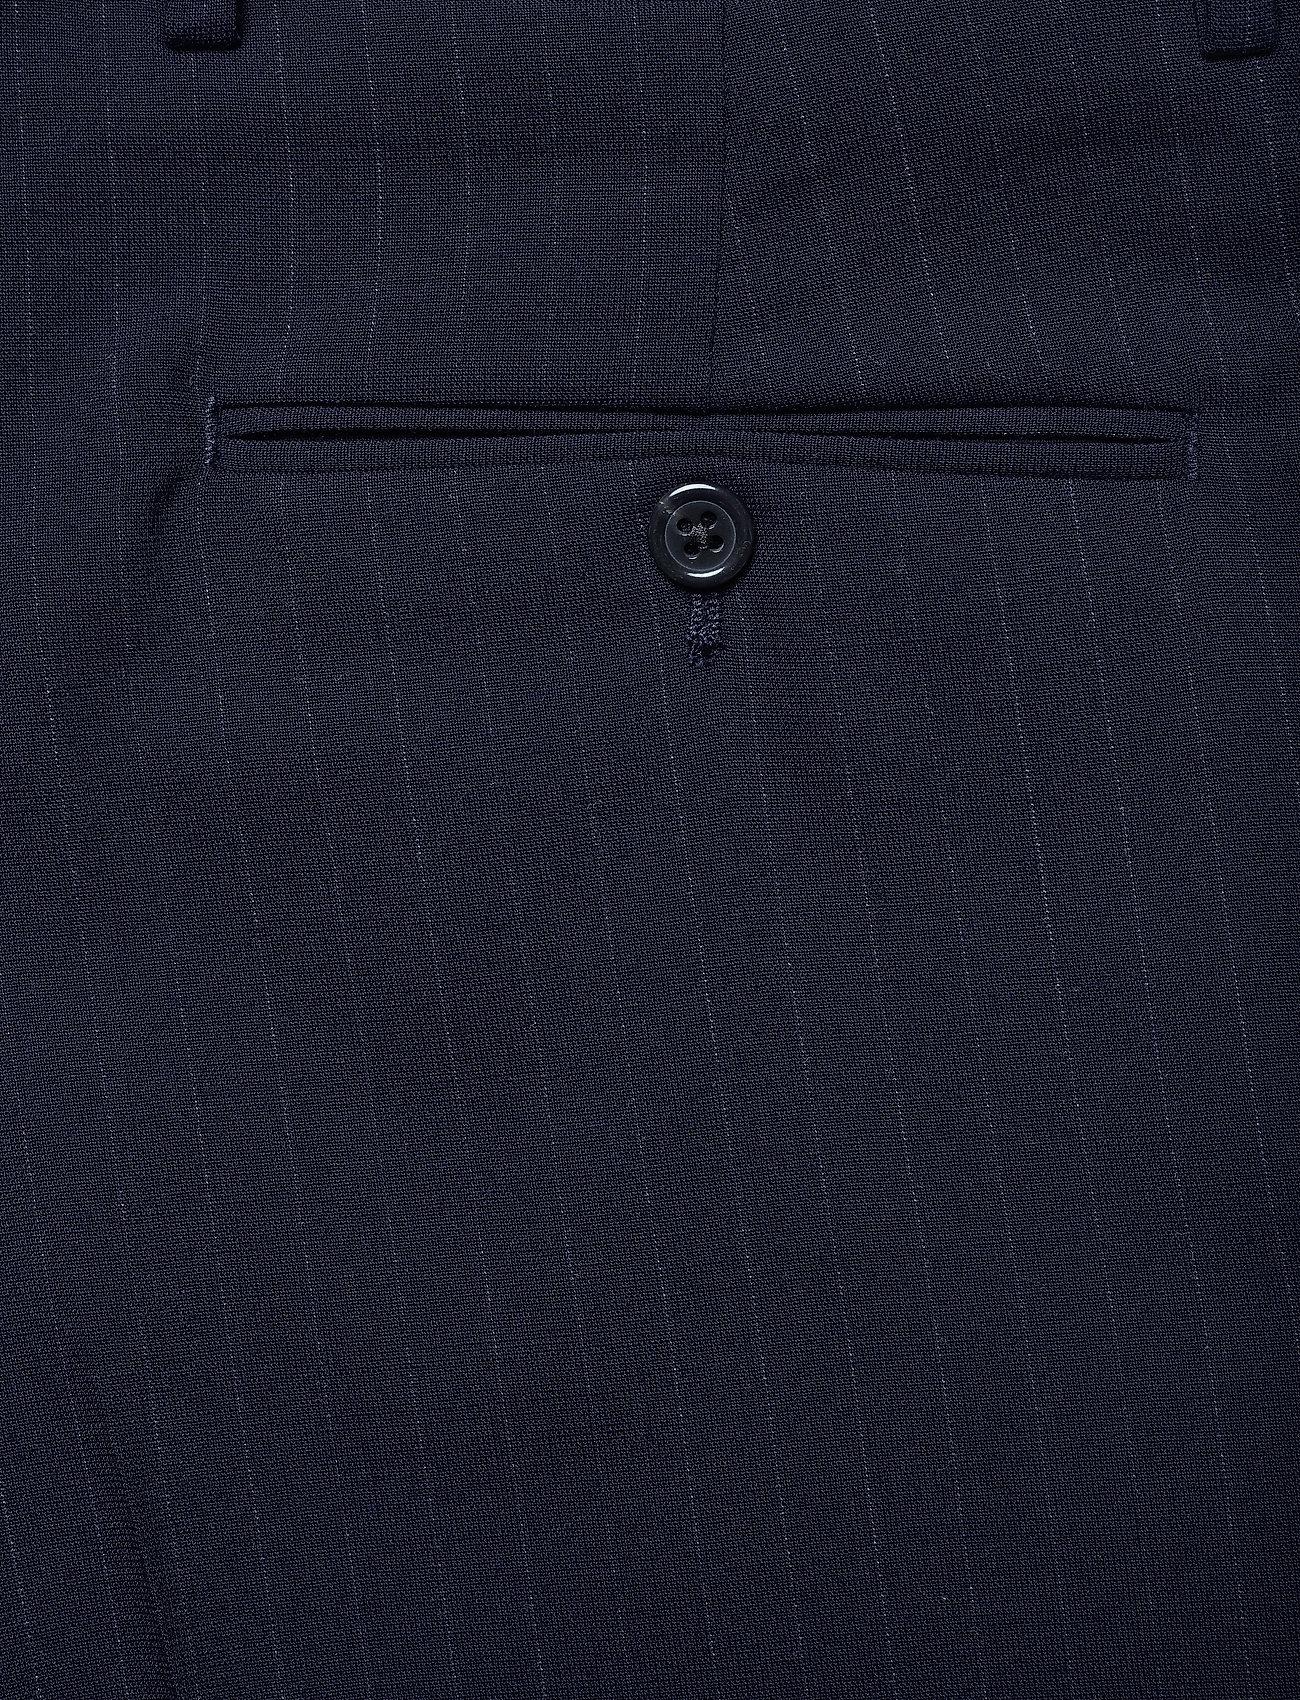 Polo Ralph Lauren Blhe-trouser - Byxor Navy/grey